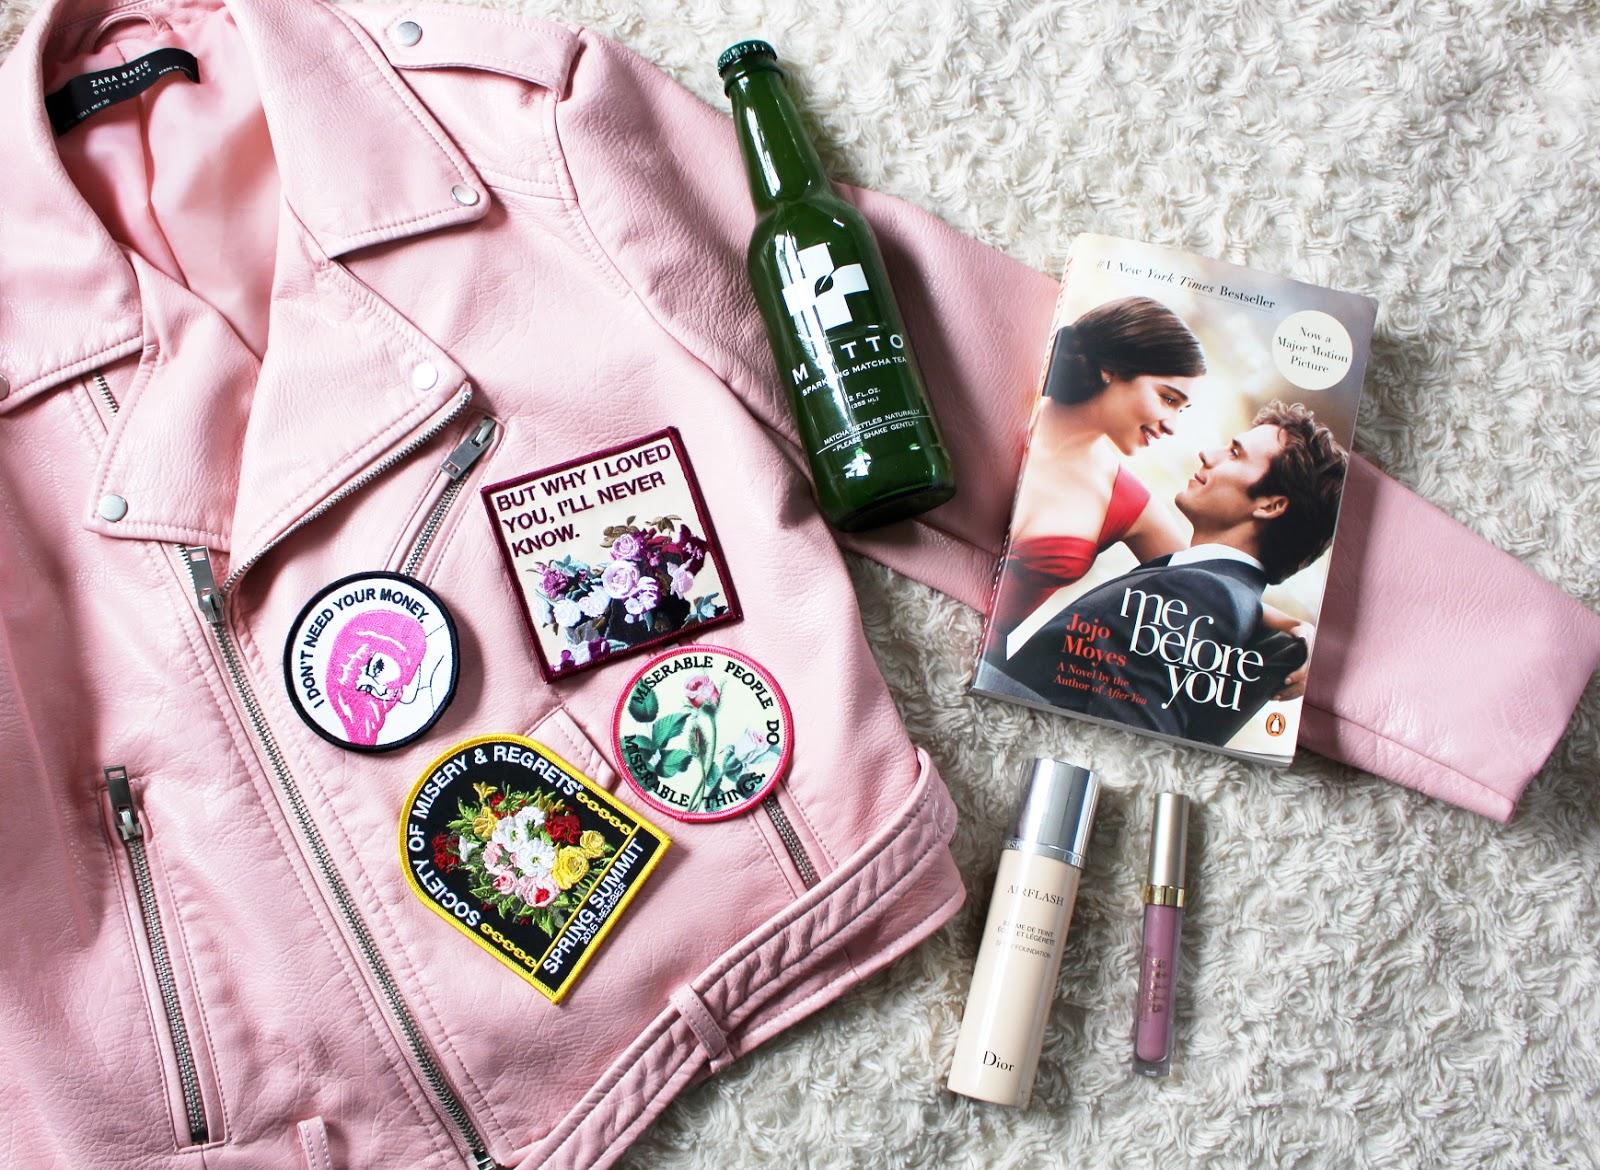 july favorites, dior airflash foundation, stila liquid lipstick baci, motto matcha, me before you, zara pink leather jacket